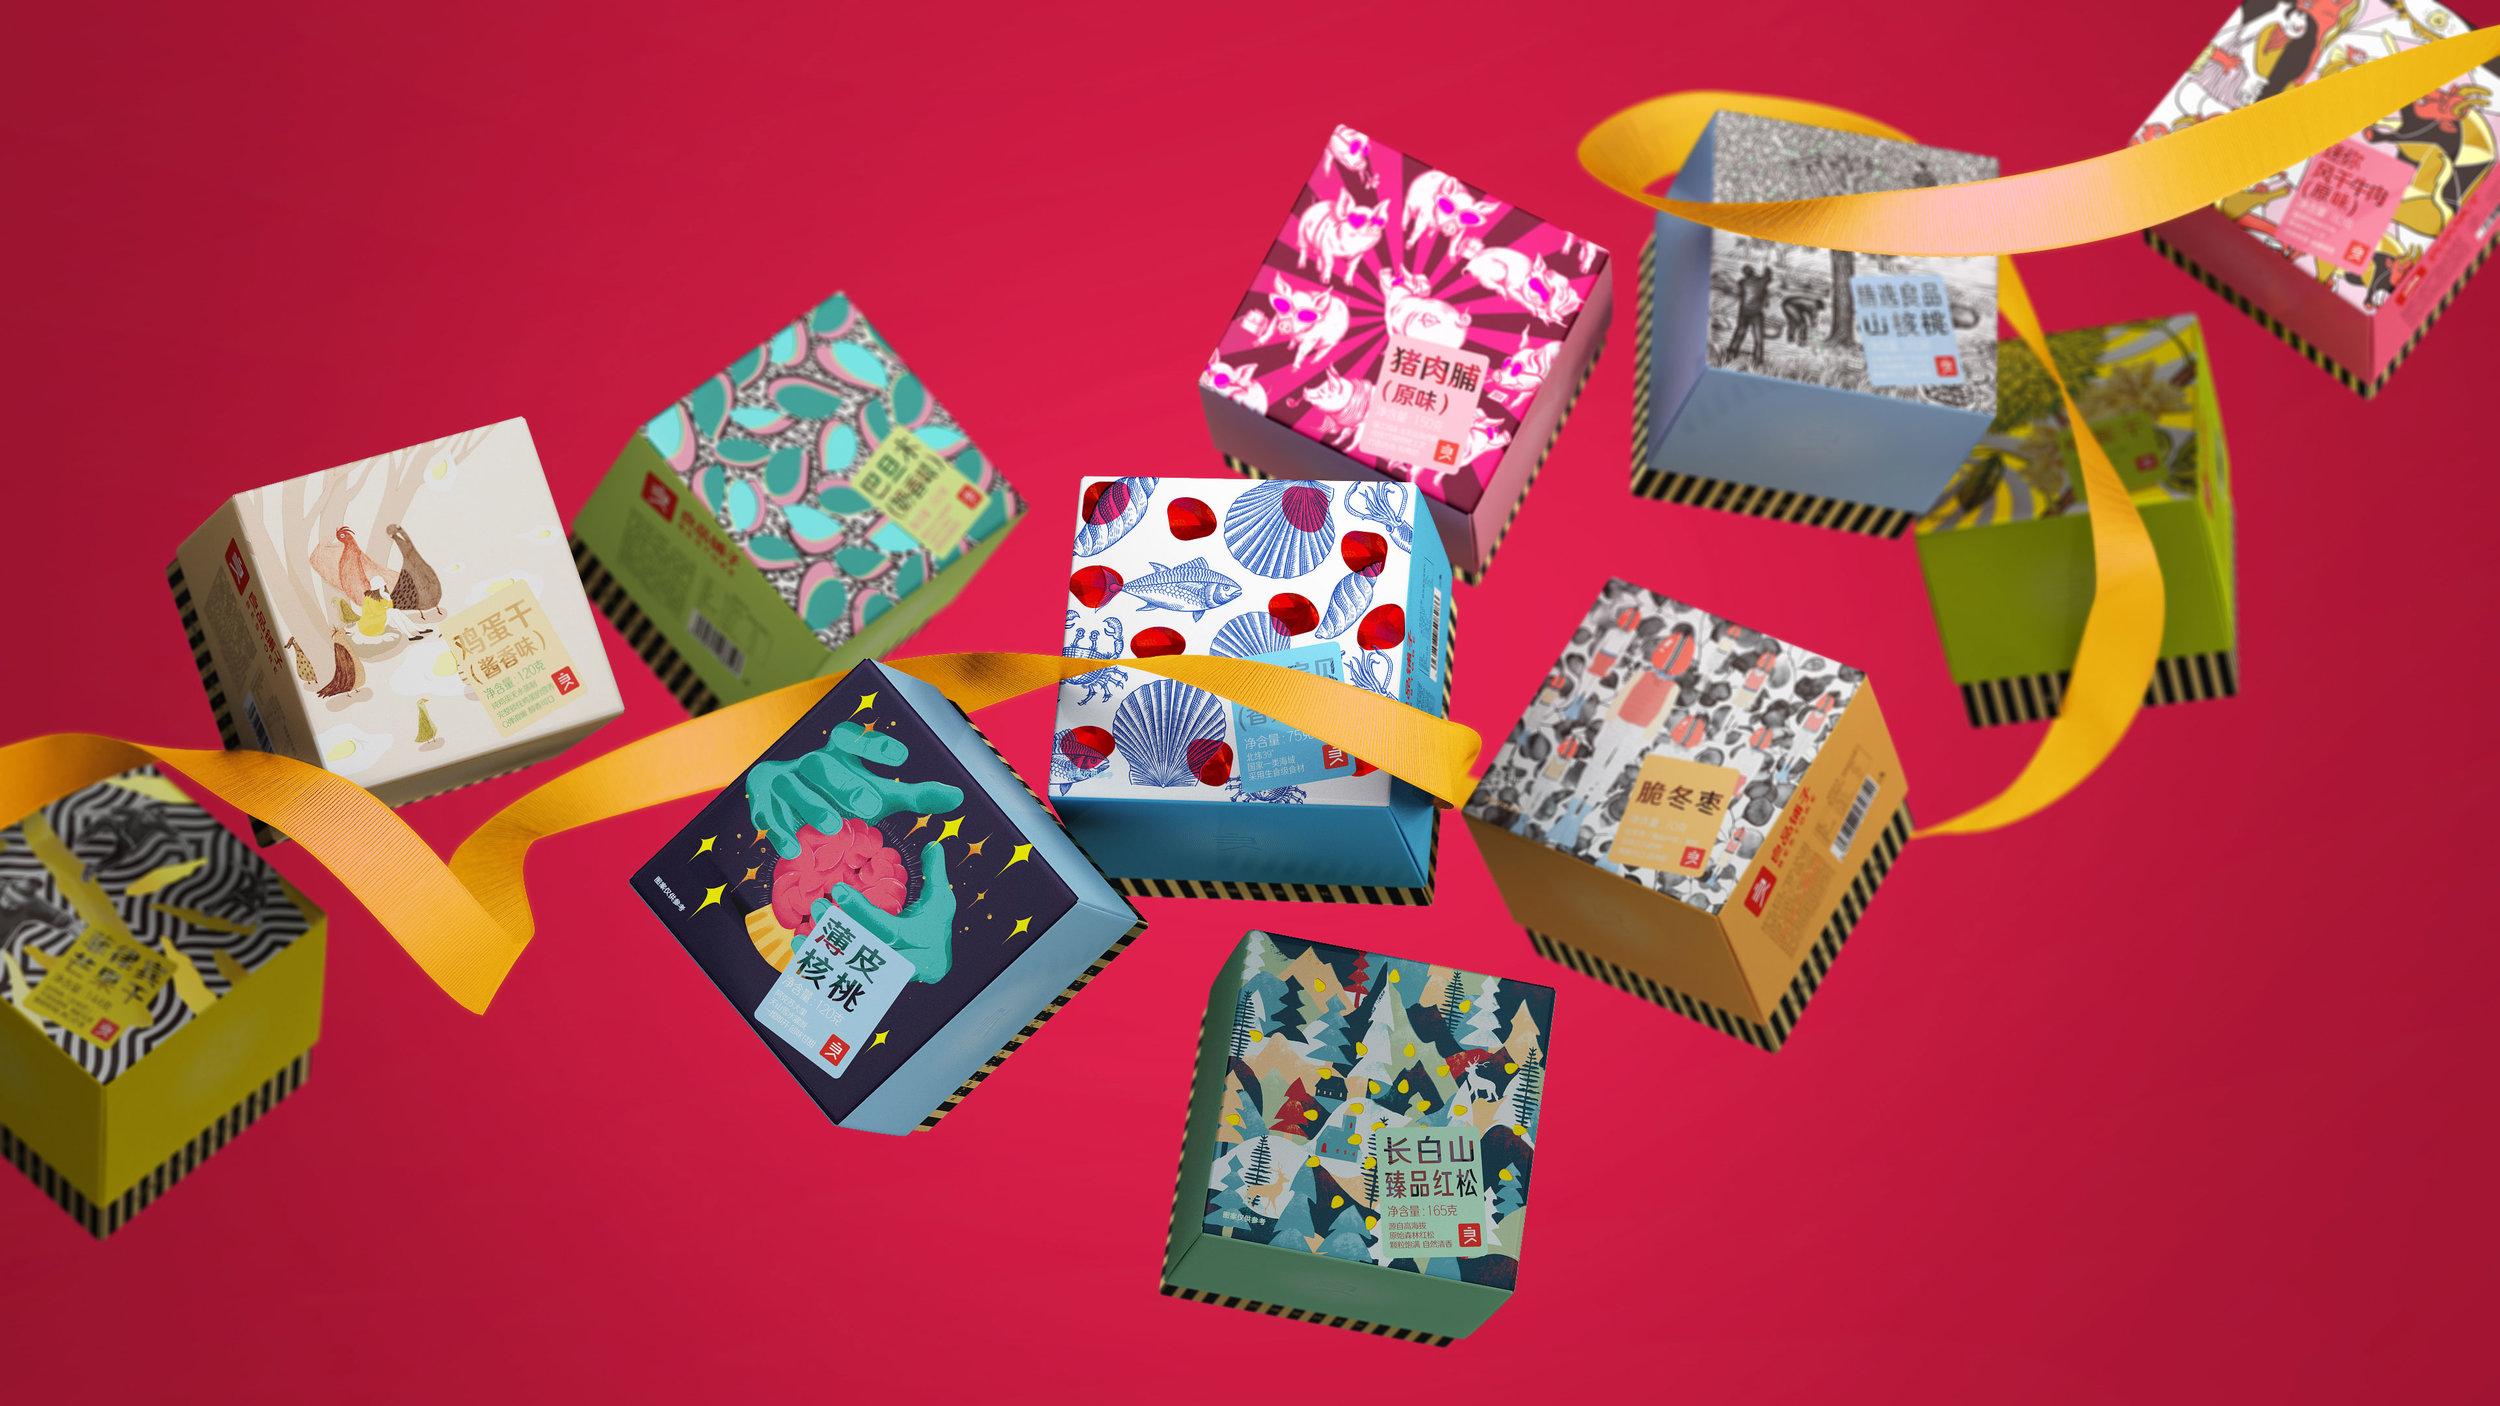 Bestore Gifted Box Packaging Design / World Brand Design Society